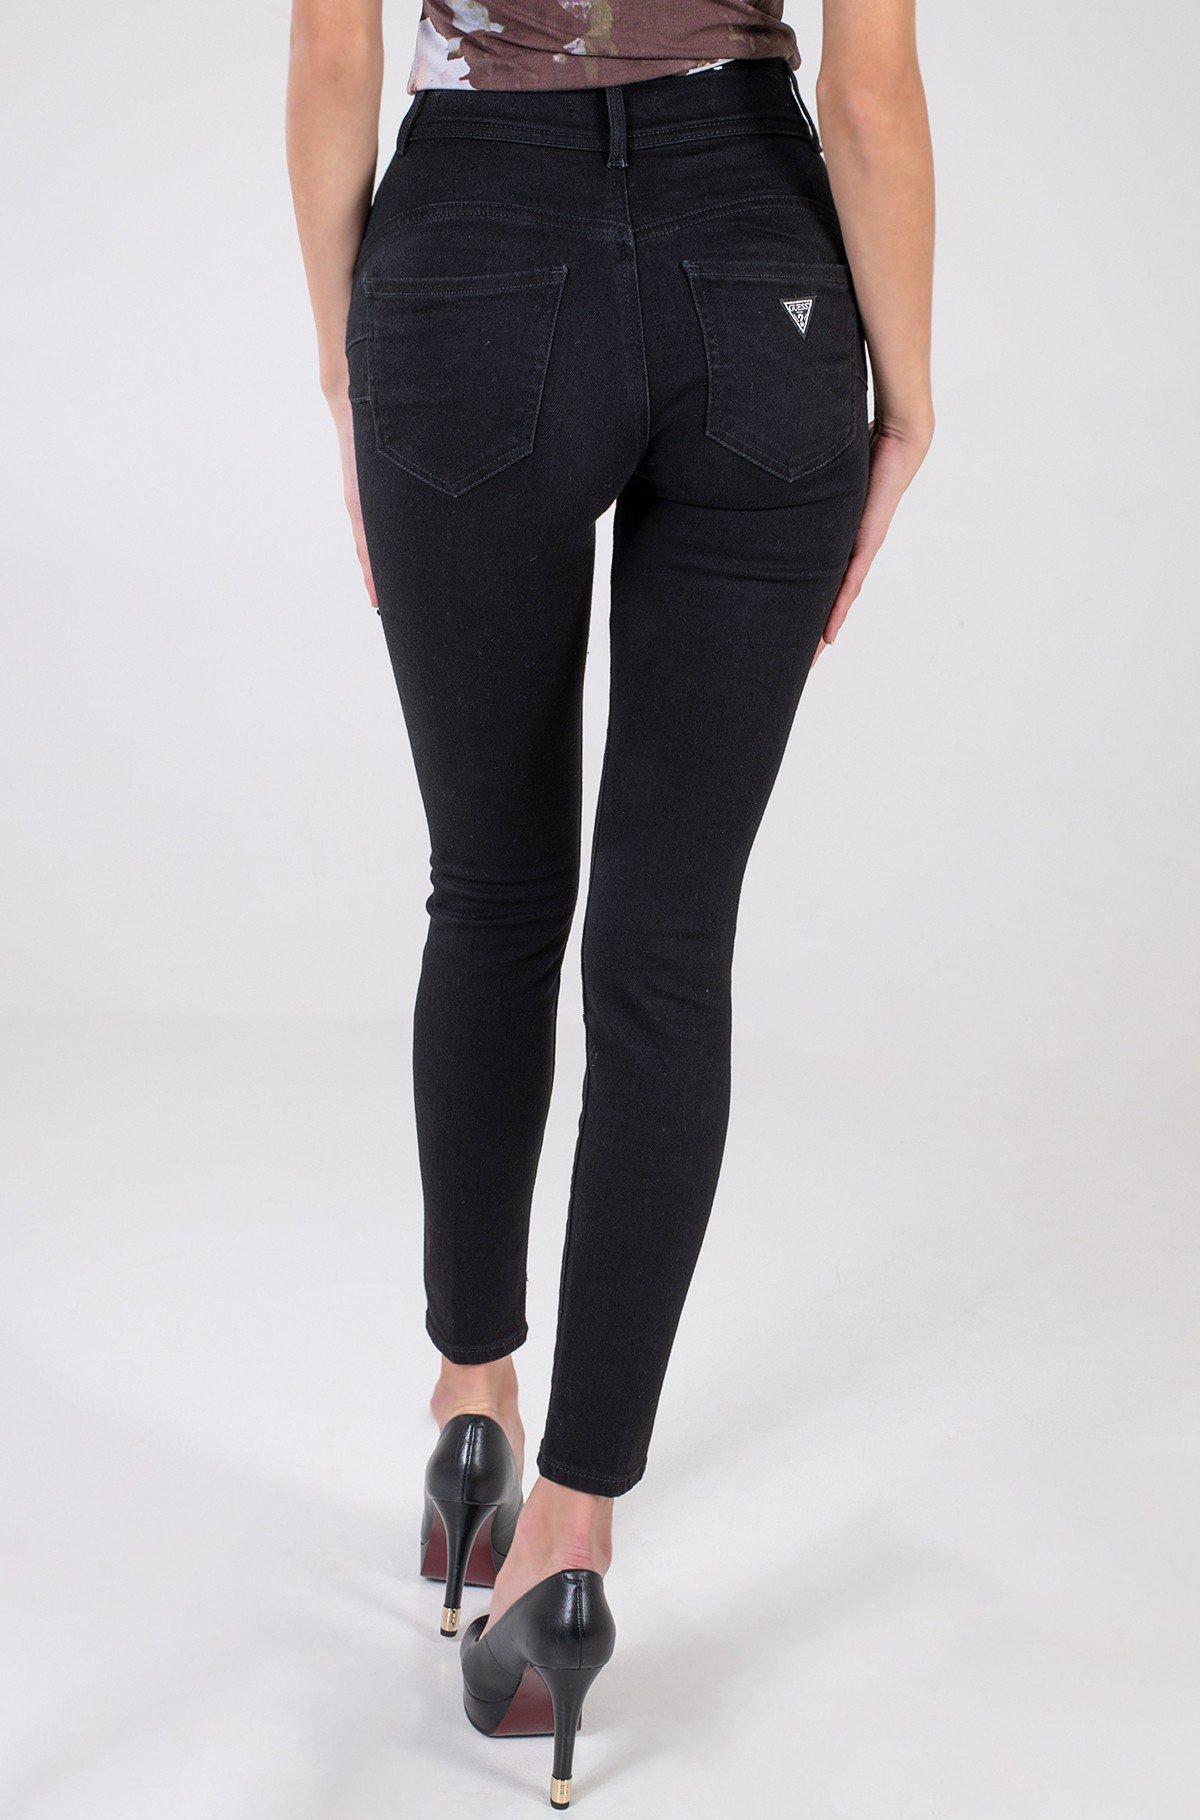 Jeans W1BA34 D4F51-full-2